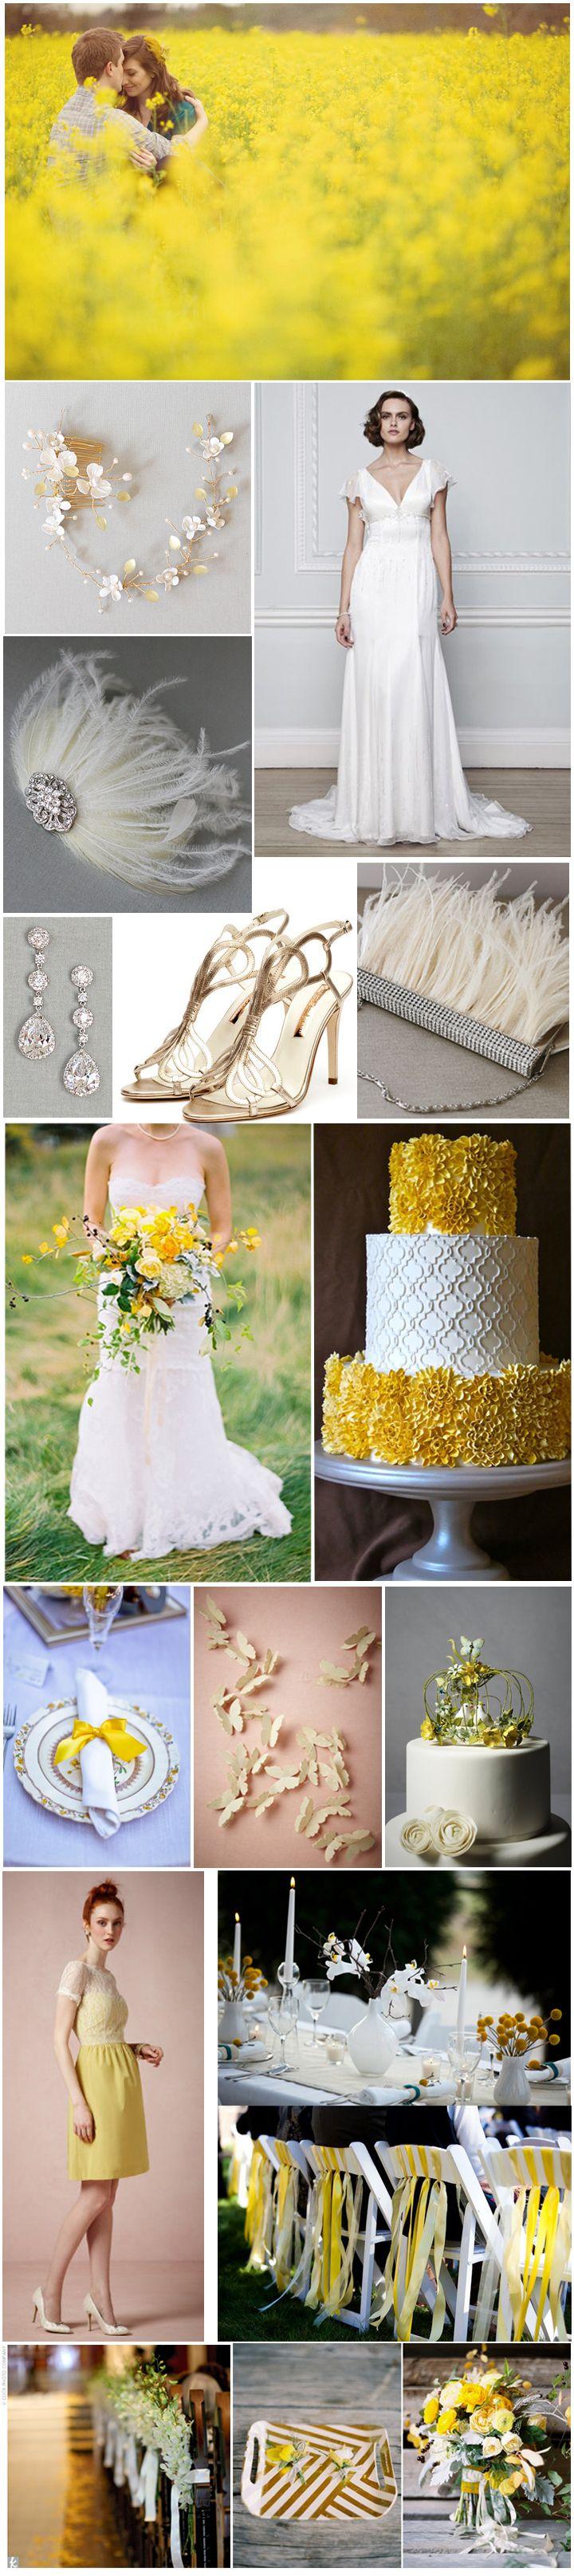 Yellow Themed Wedding